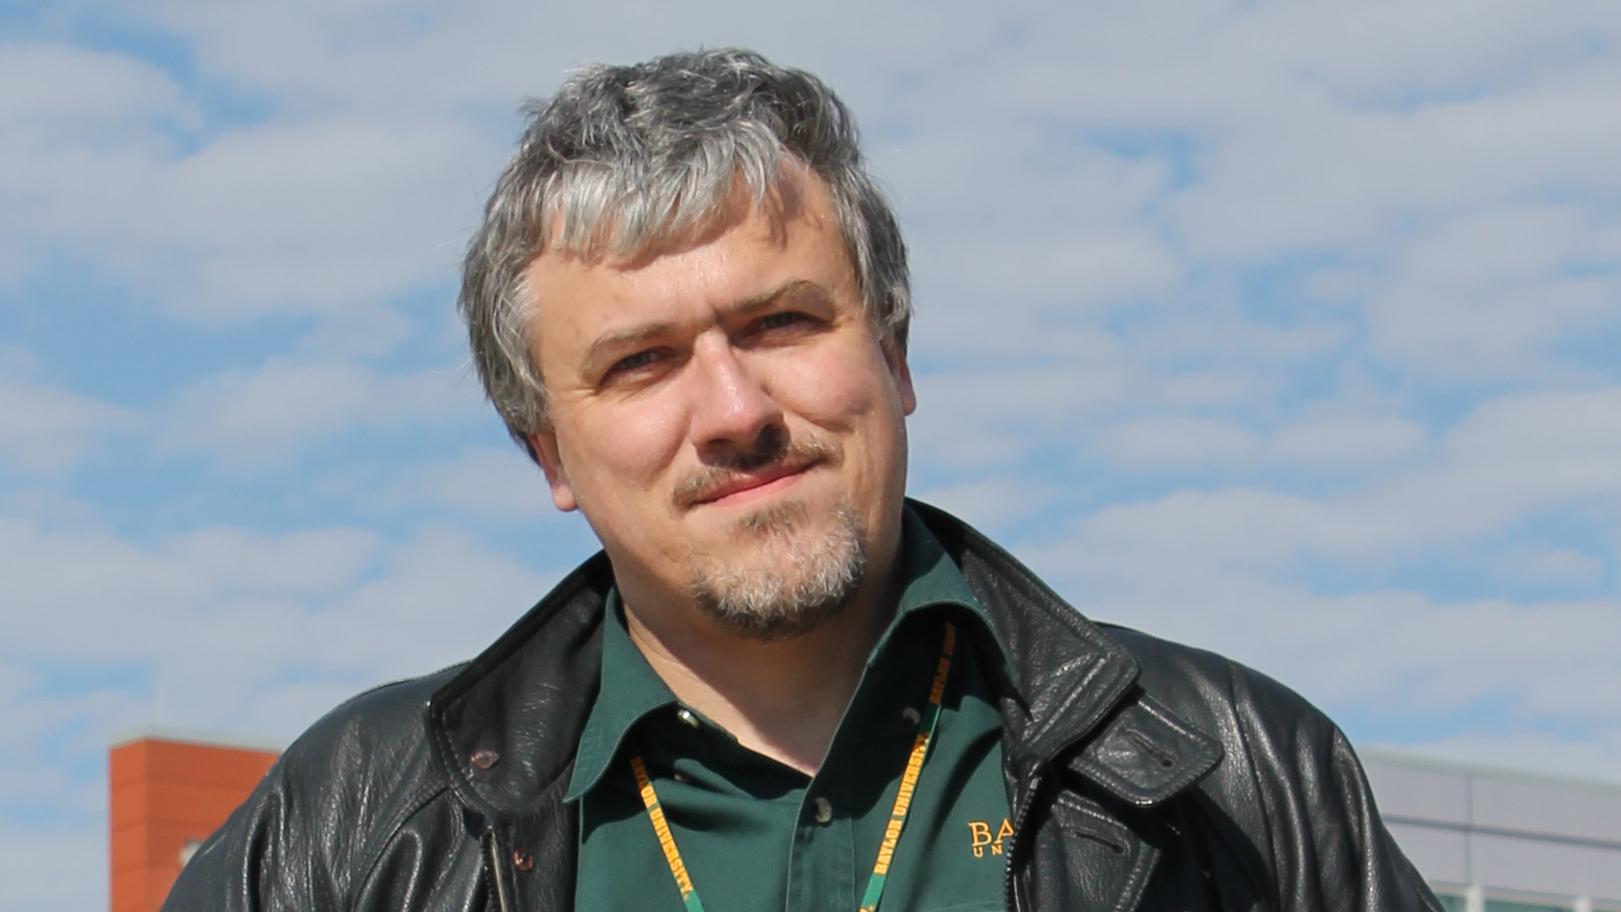 News - Rene Laufer TED-Ed